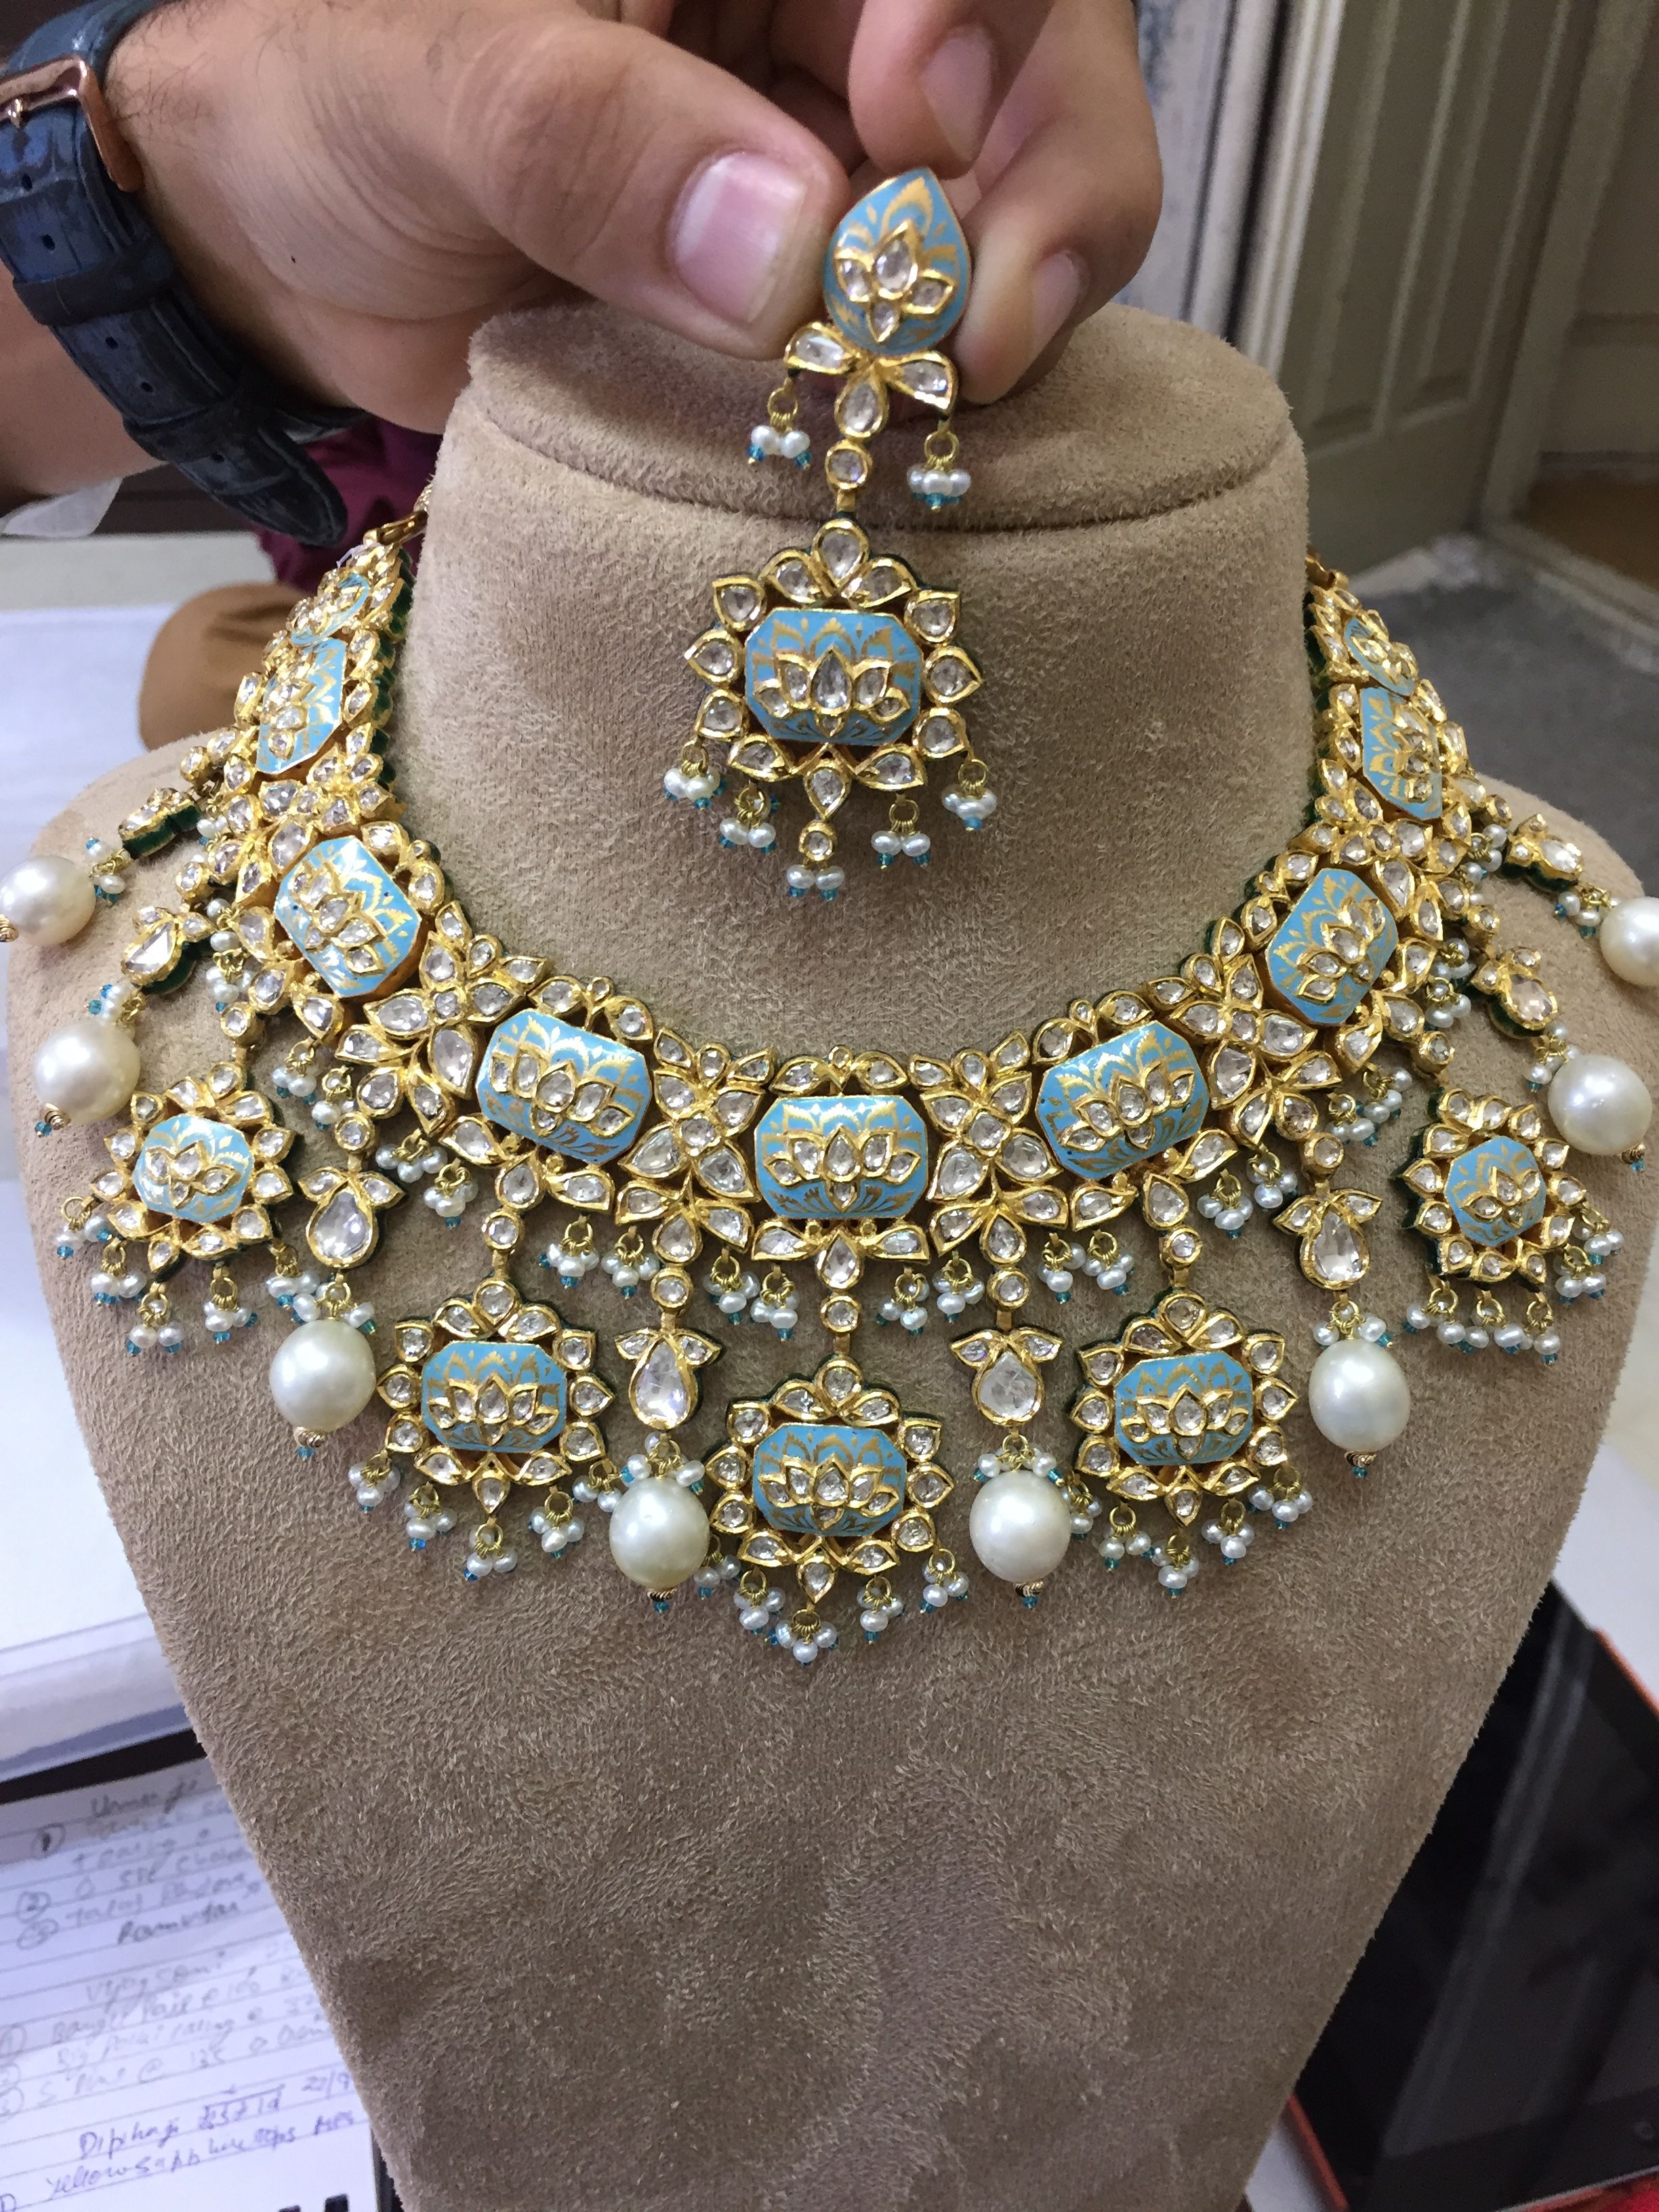 713b96a6d Feroze Meena necklace with rose cut diamonds   necklaces in 2019 ...